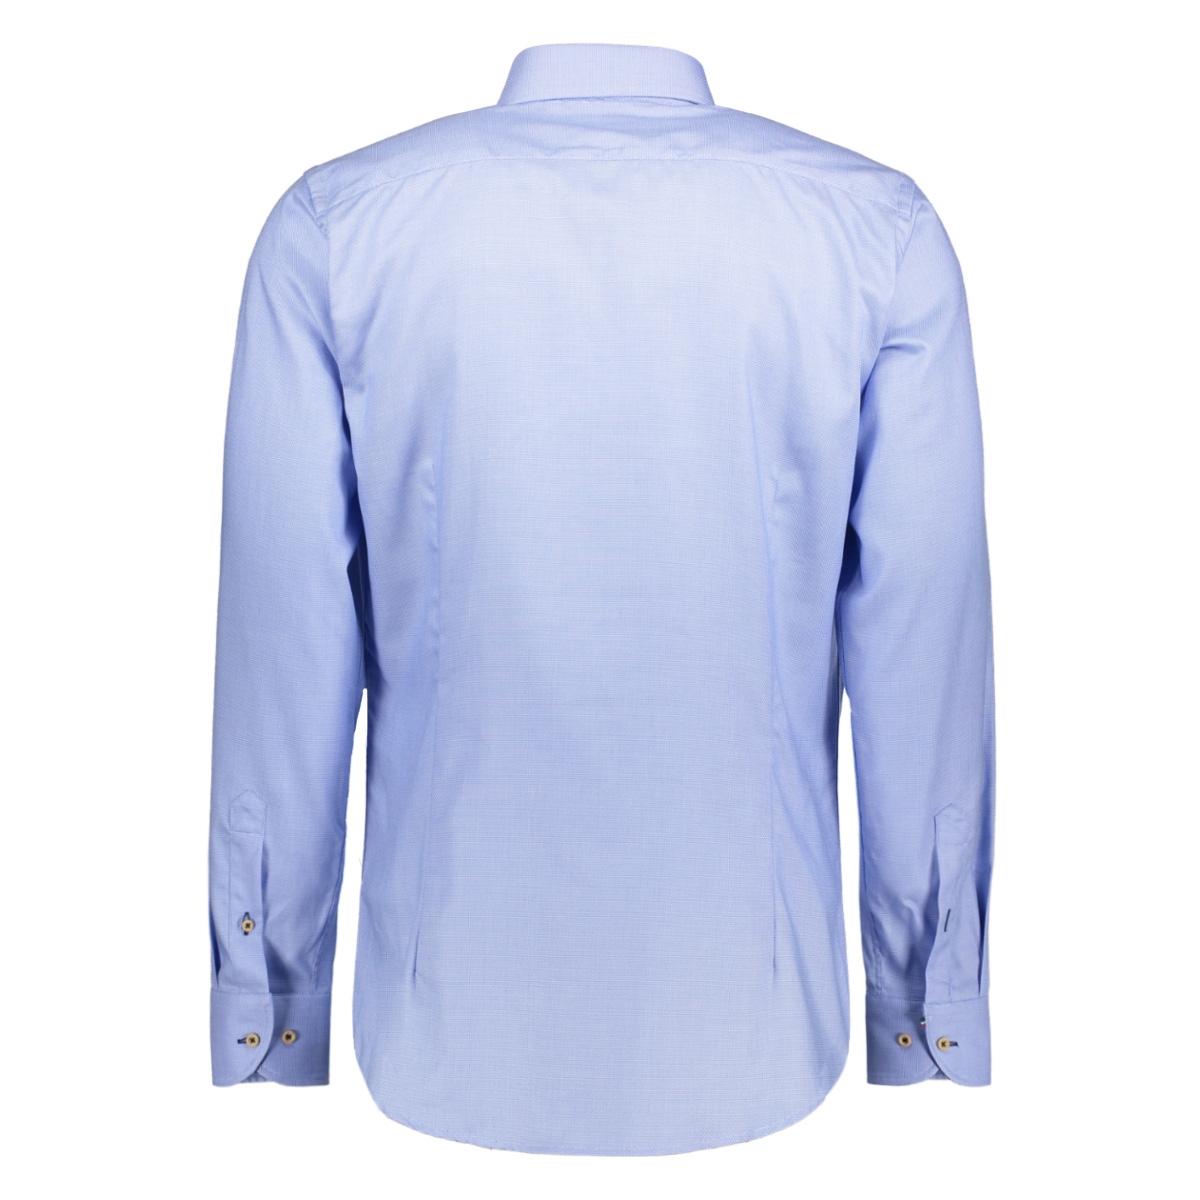 21-244812-17pm314-5 marnelli overhemd 012